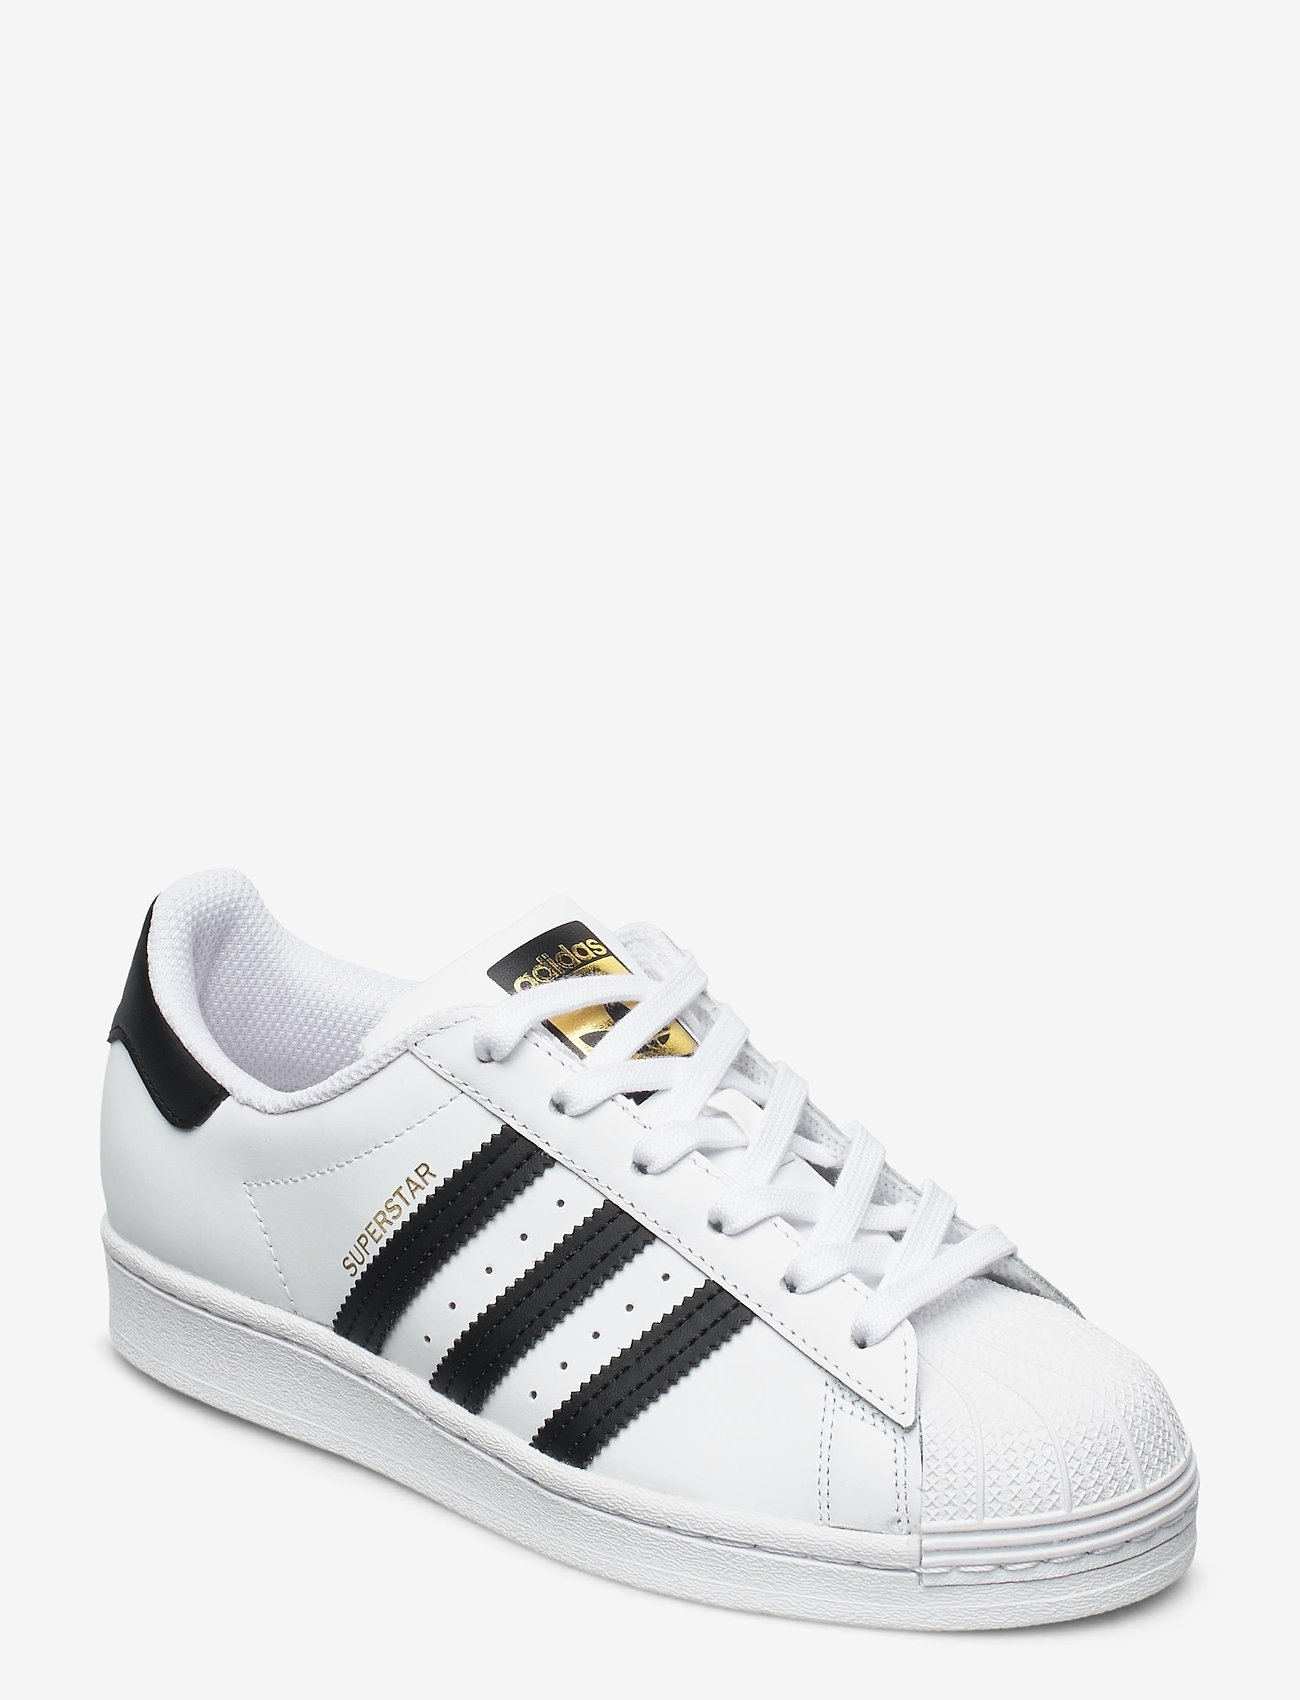 adidas Originals - Superstar  W - low top sneakers - ftwwht/cblack/ftwwht - 0